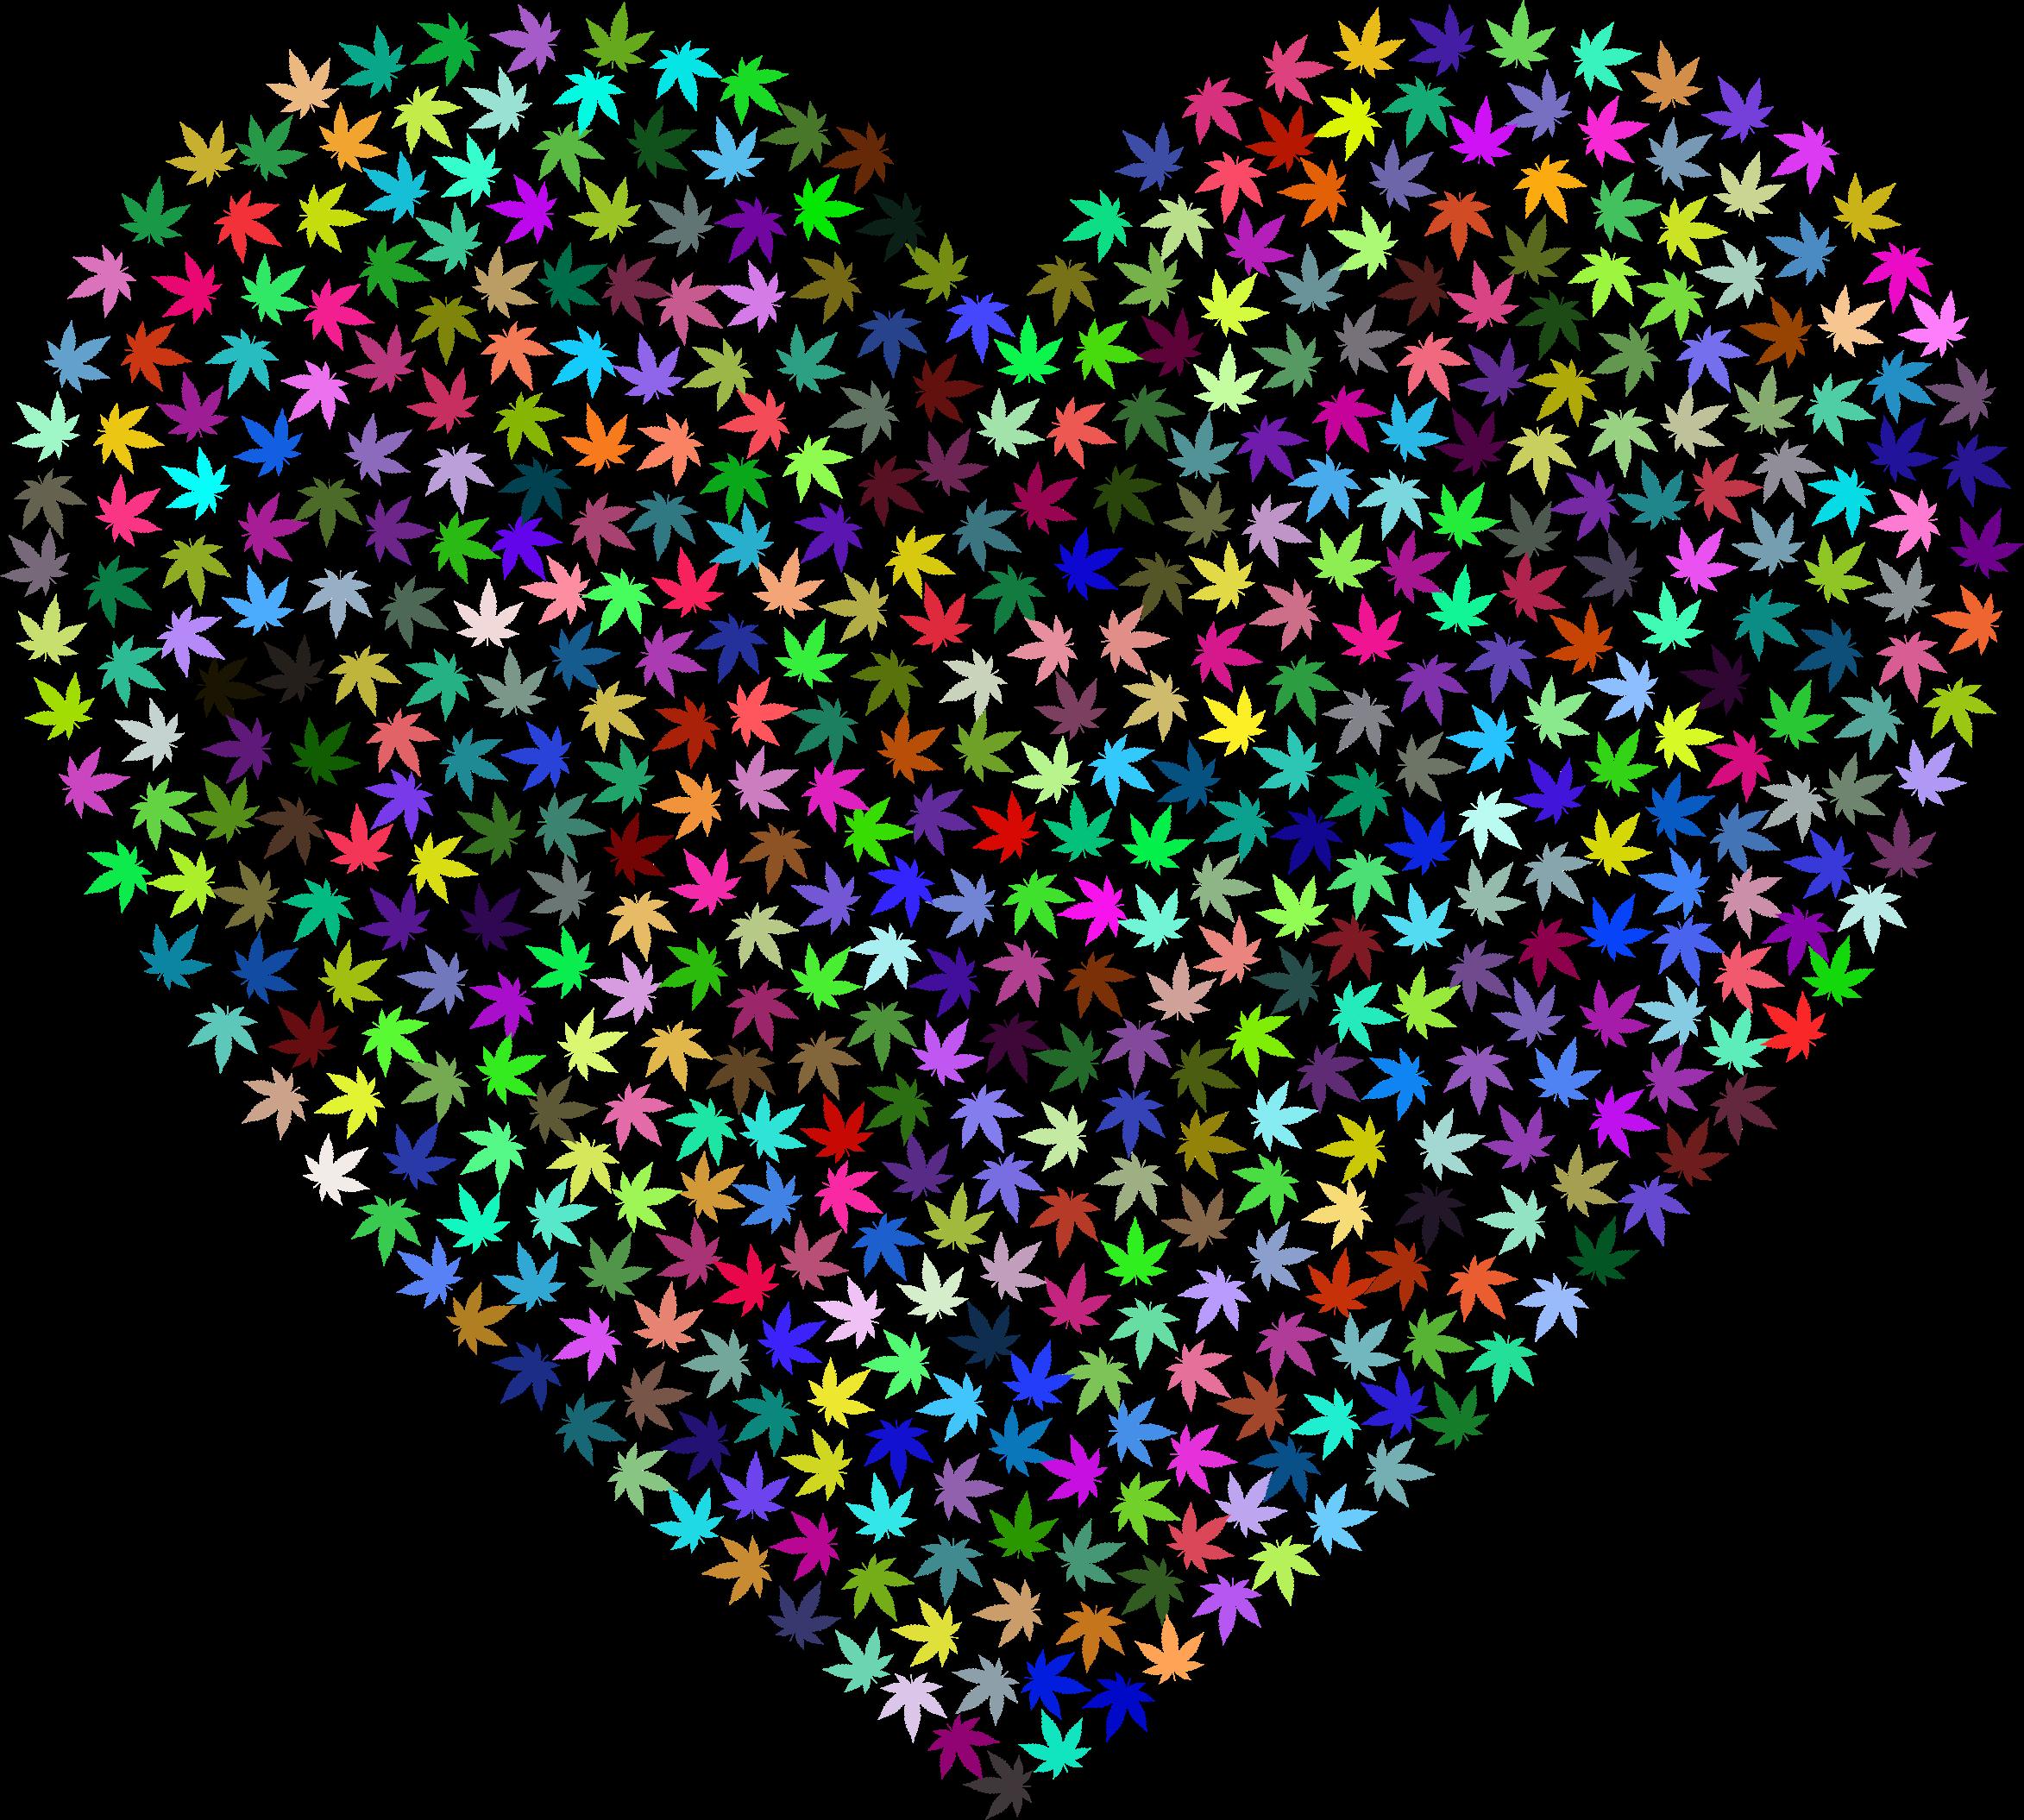 Drug clipart heart. Marijuana prismatic big image